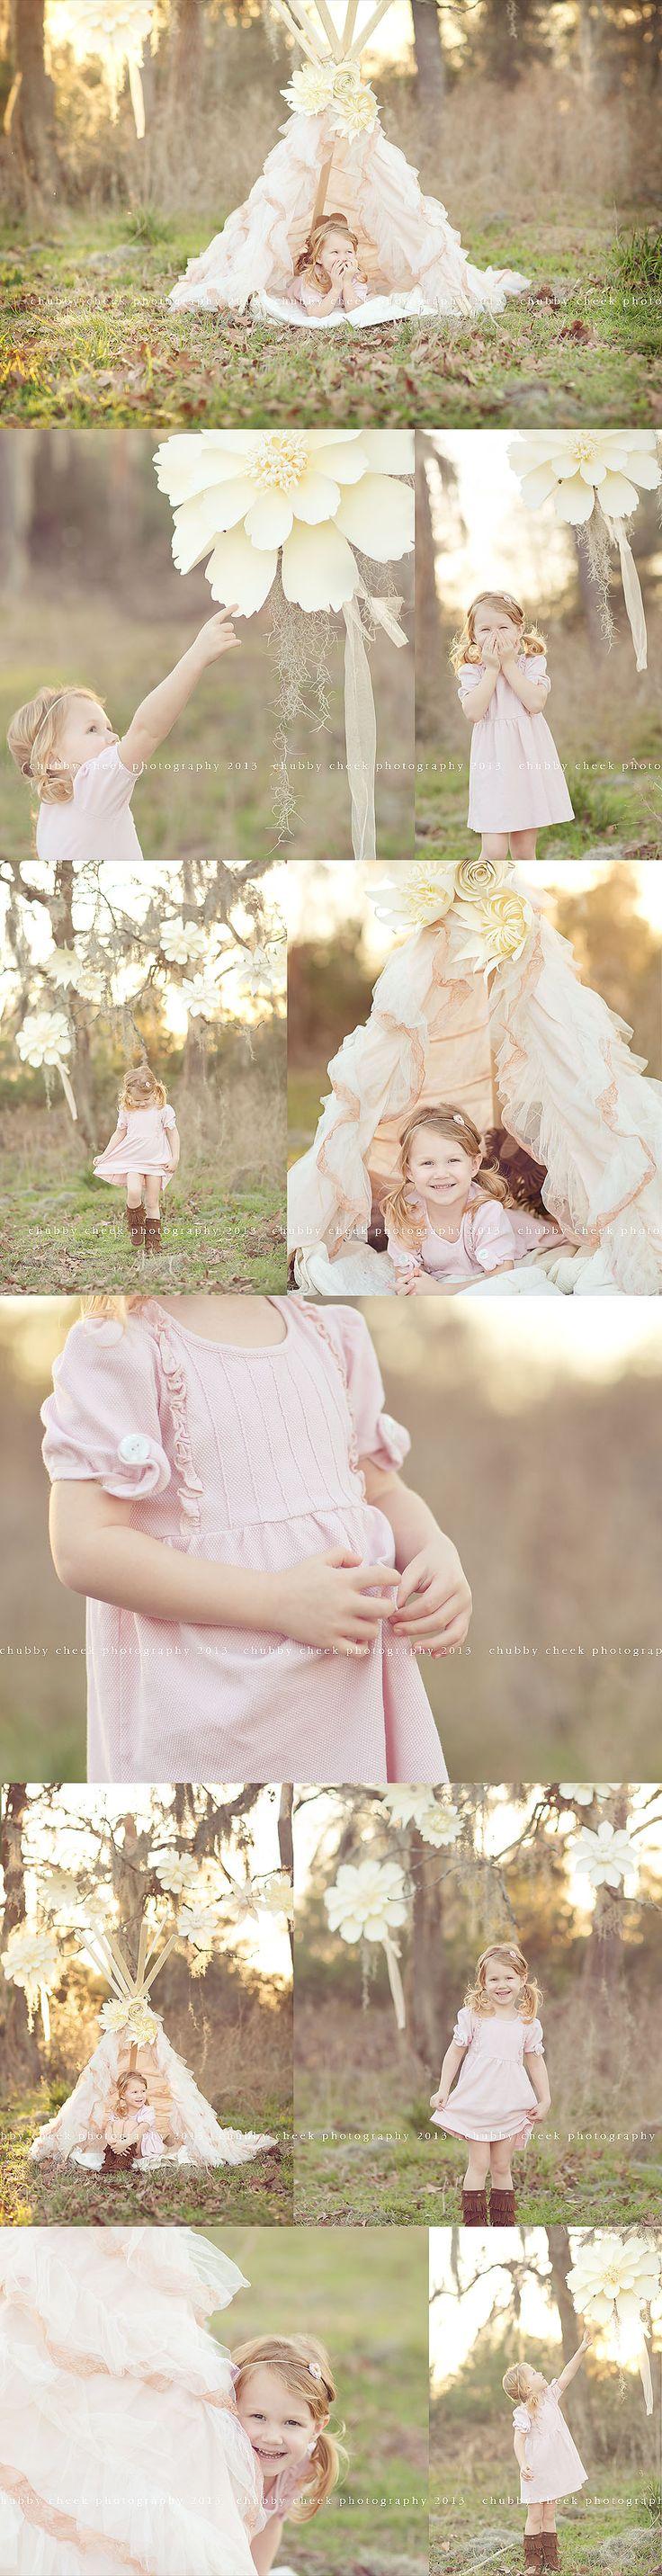 Chubby Cheek Photography Houston, TX Natural Light Photographer » Houston Baby…